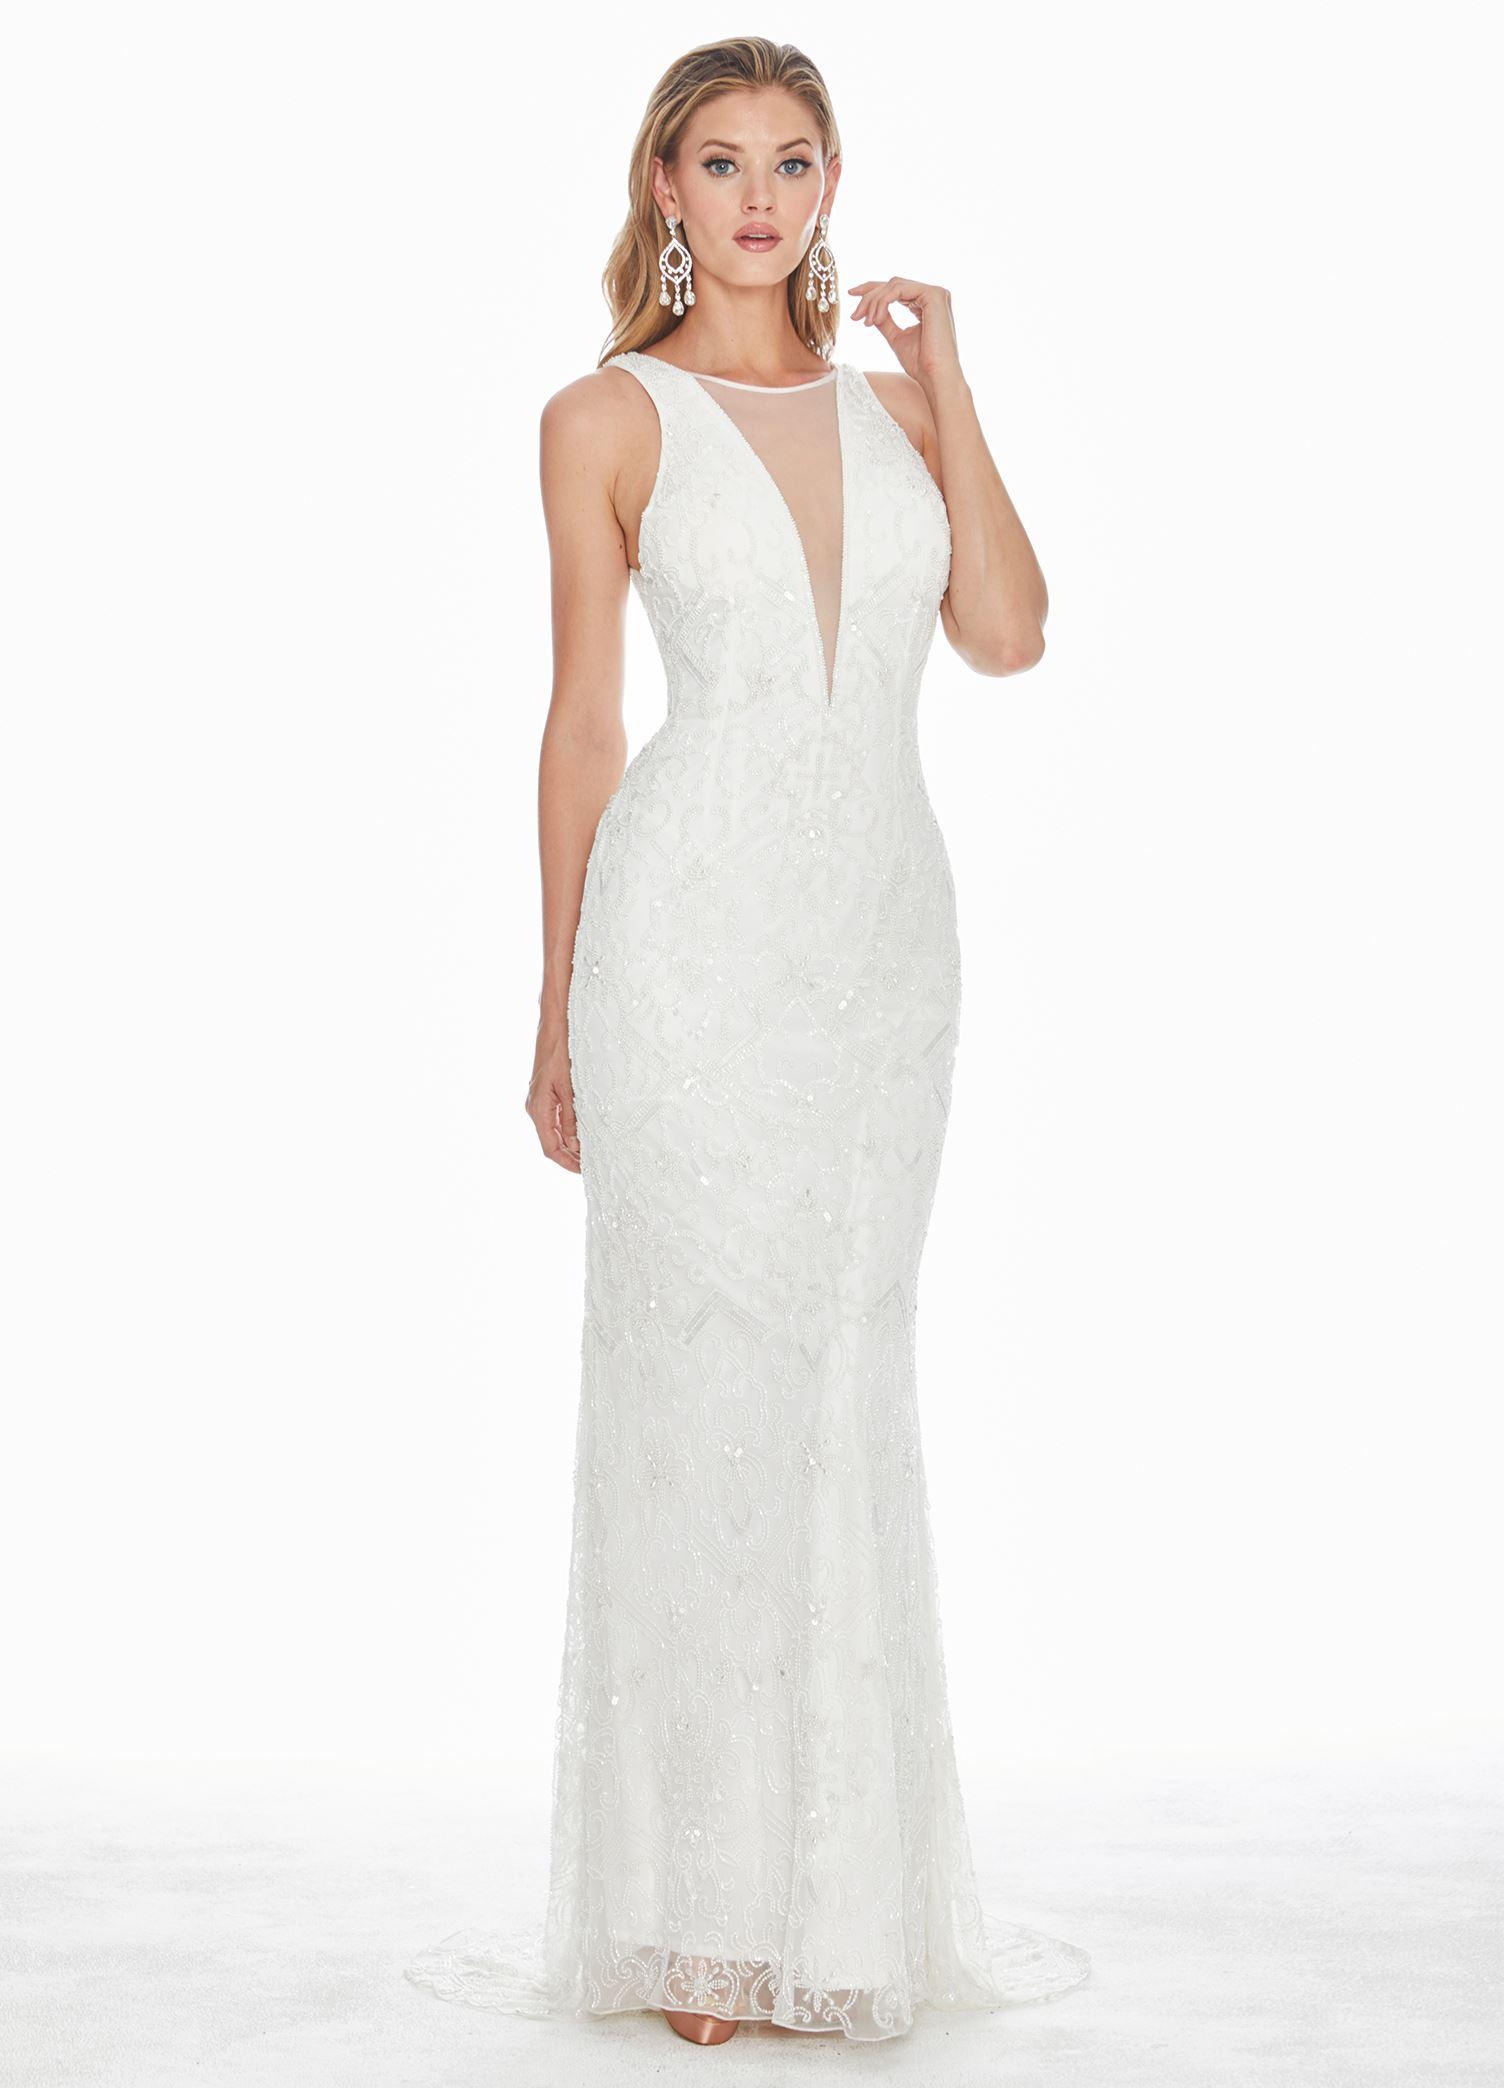 f2dc0841 Ashley Lauren - Square Back Evening Dress | ASHLEYlauren